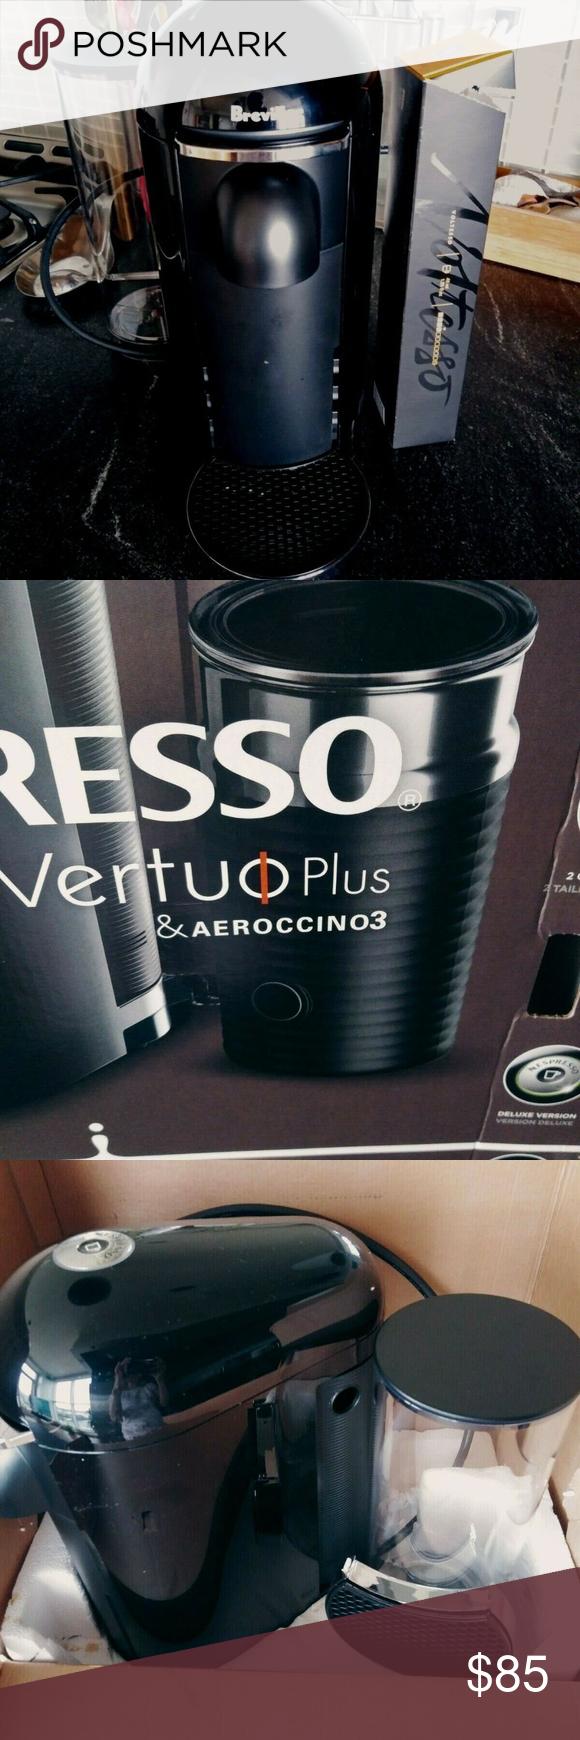 Nespresso VertuoPlus Coffee Maker + 7 Coffee Pods